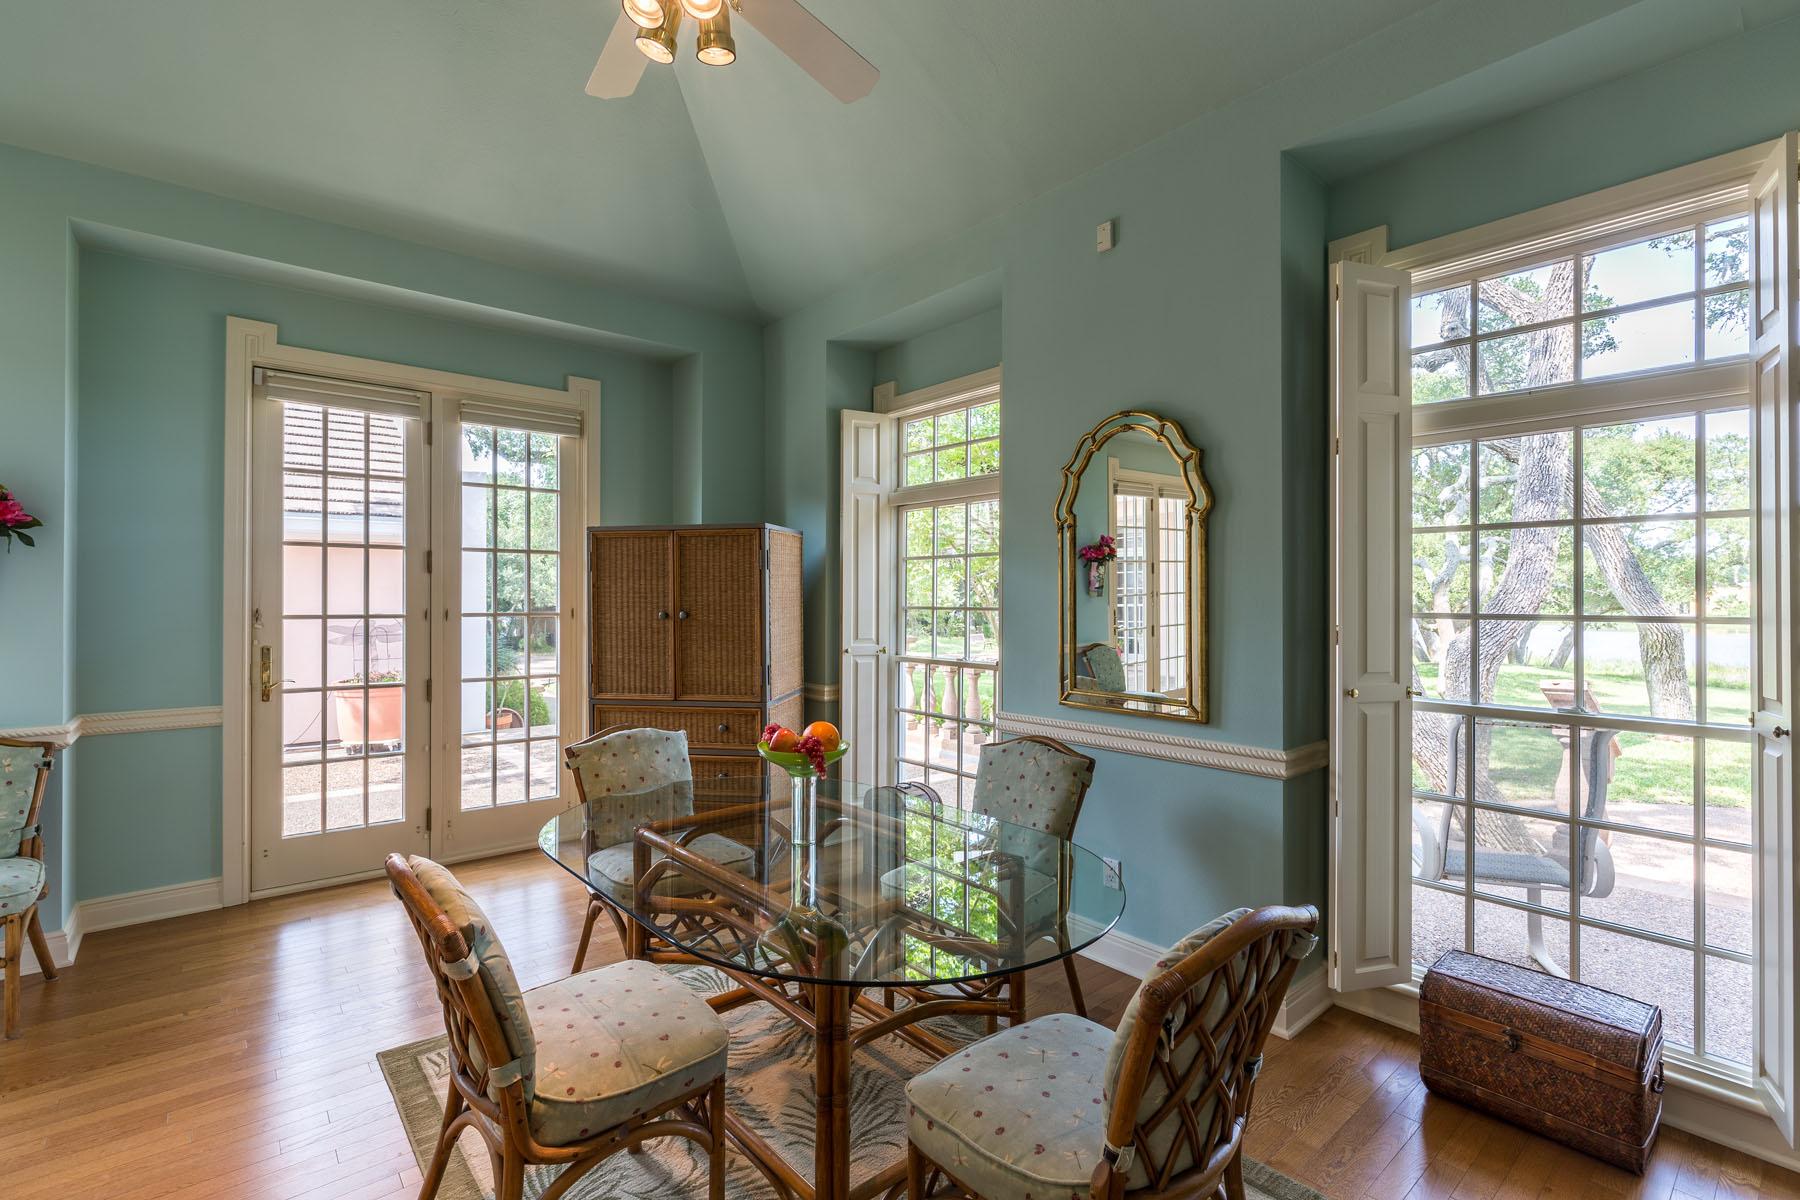 Additional photo for property listing at Villa Maria Estate 2114 Lakeview Dr Rockport, Texas 78382 Estados Unidos